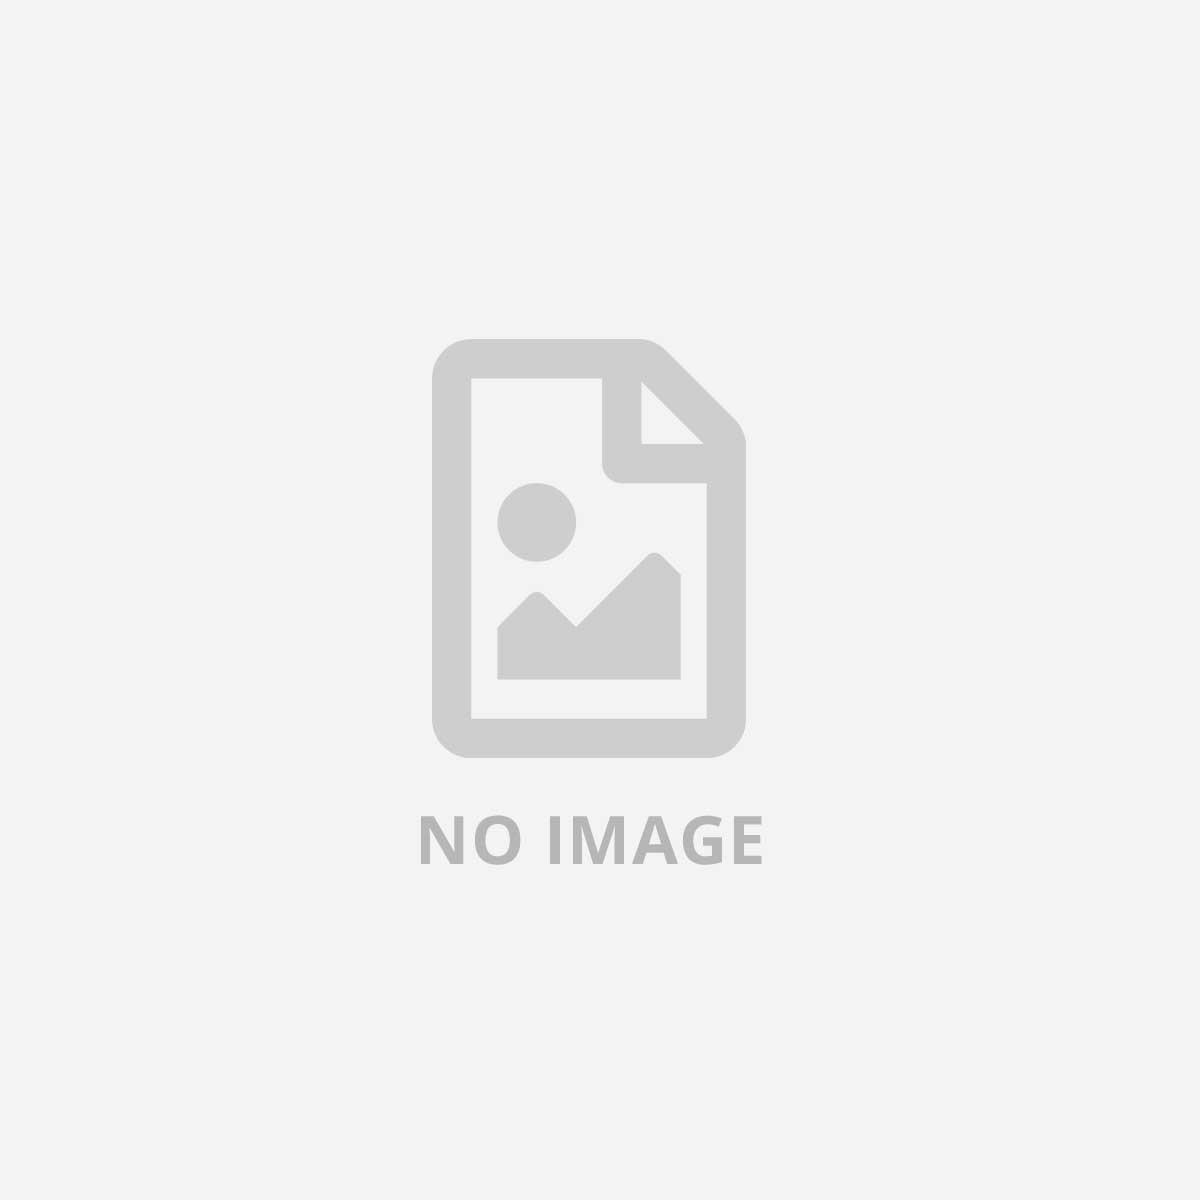 MAXELL CUPCAKE EARPHONES PINK